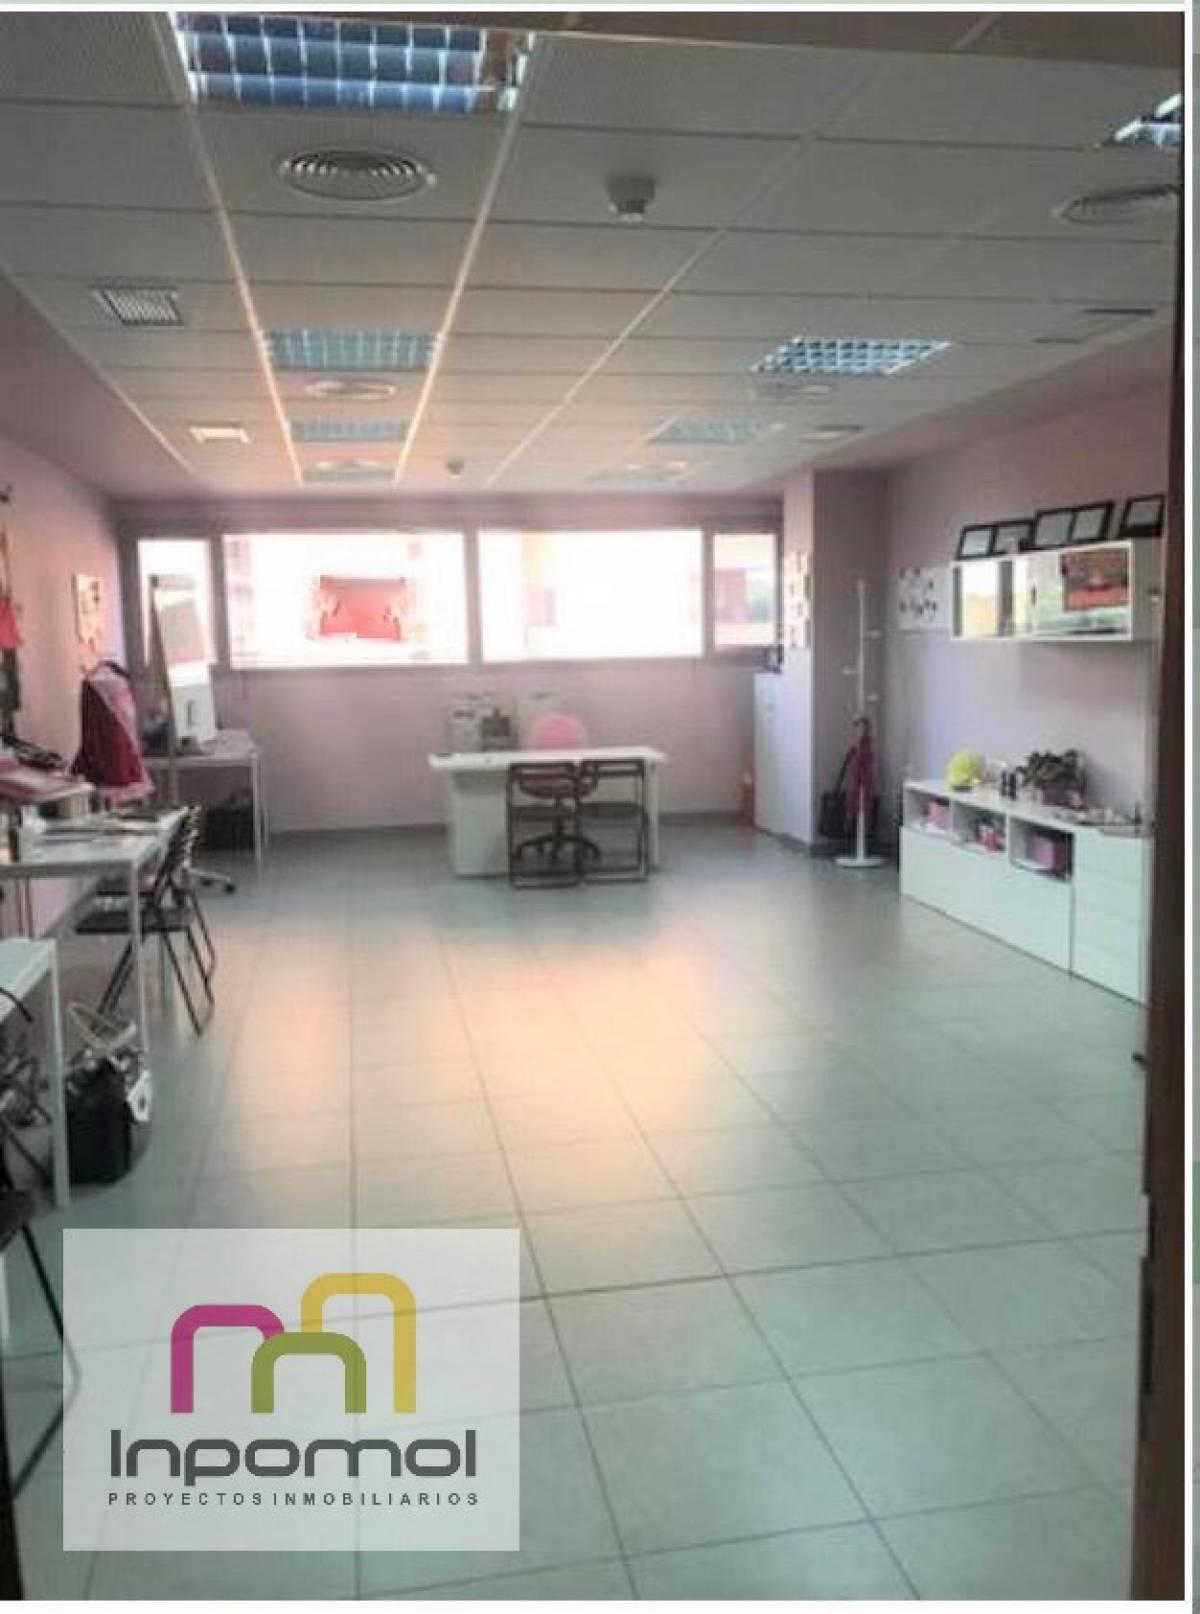 Office for rent in Valdepasillas, Badajoz